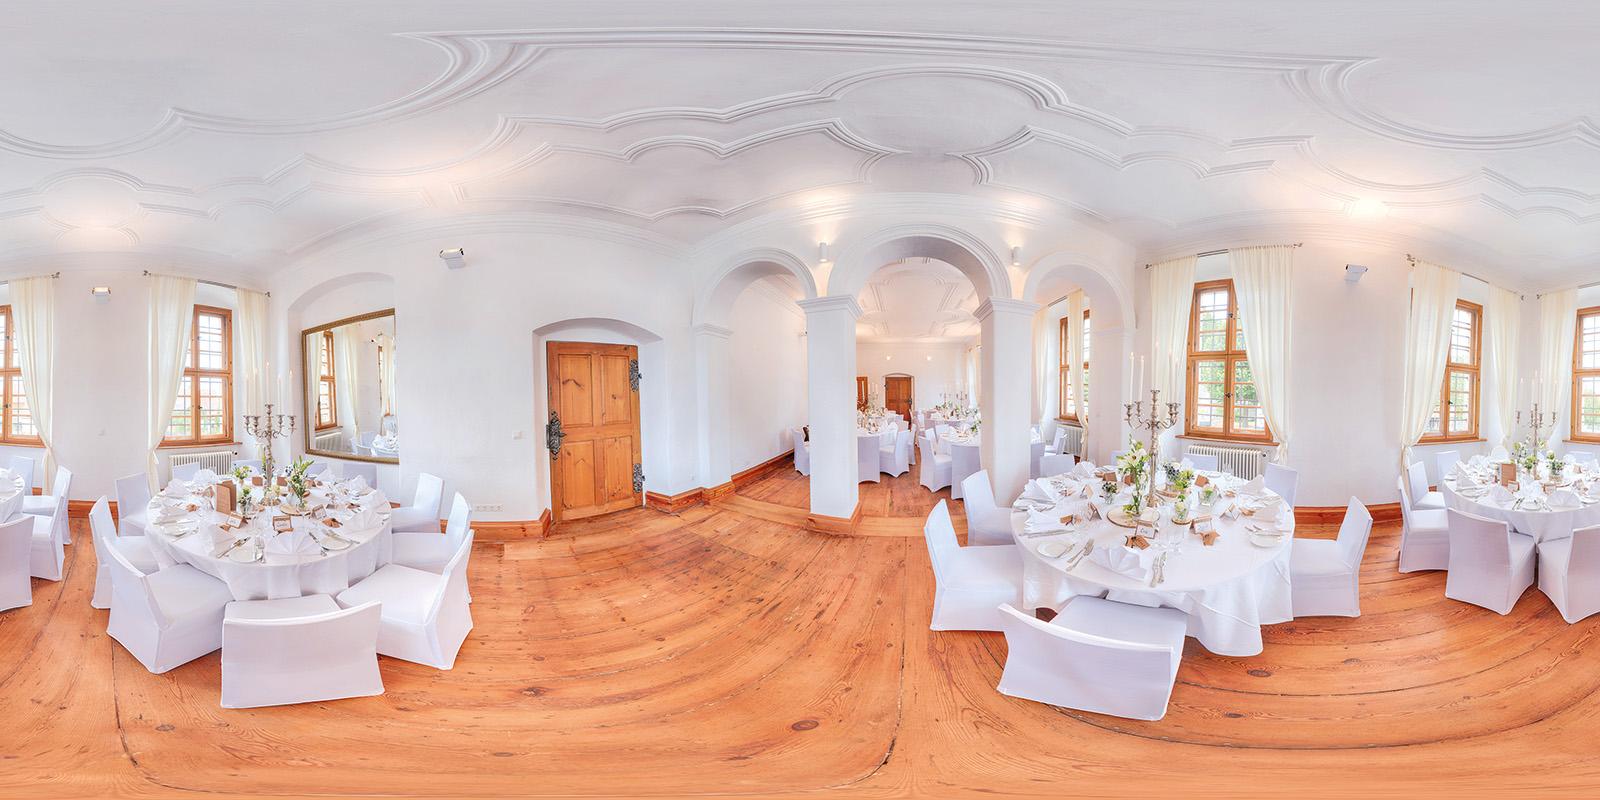 Panorama - Barocksaal Schloß Hemhofen